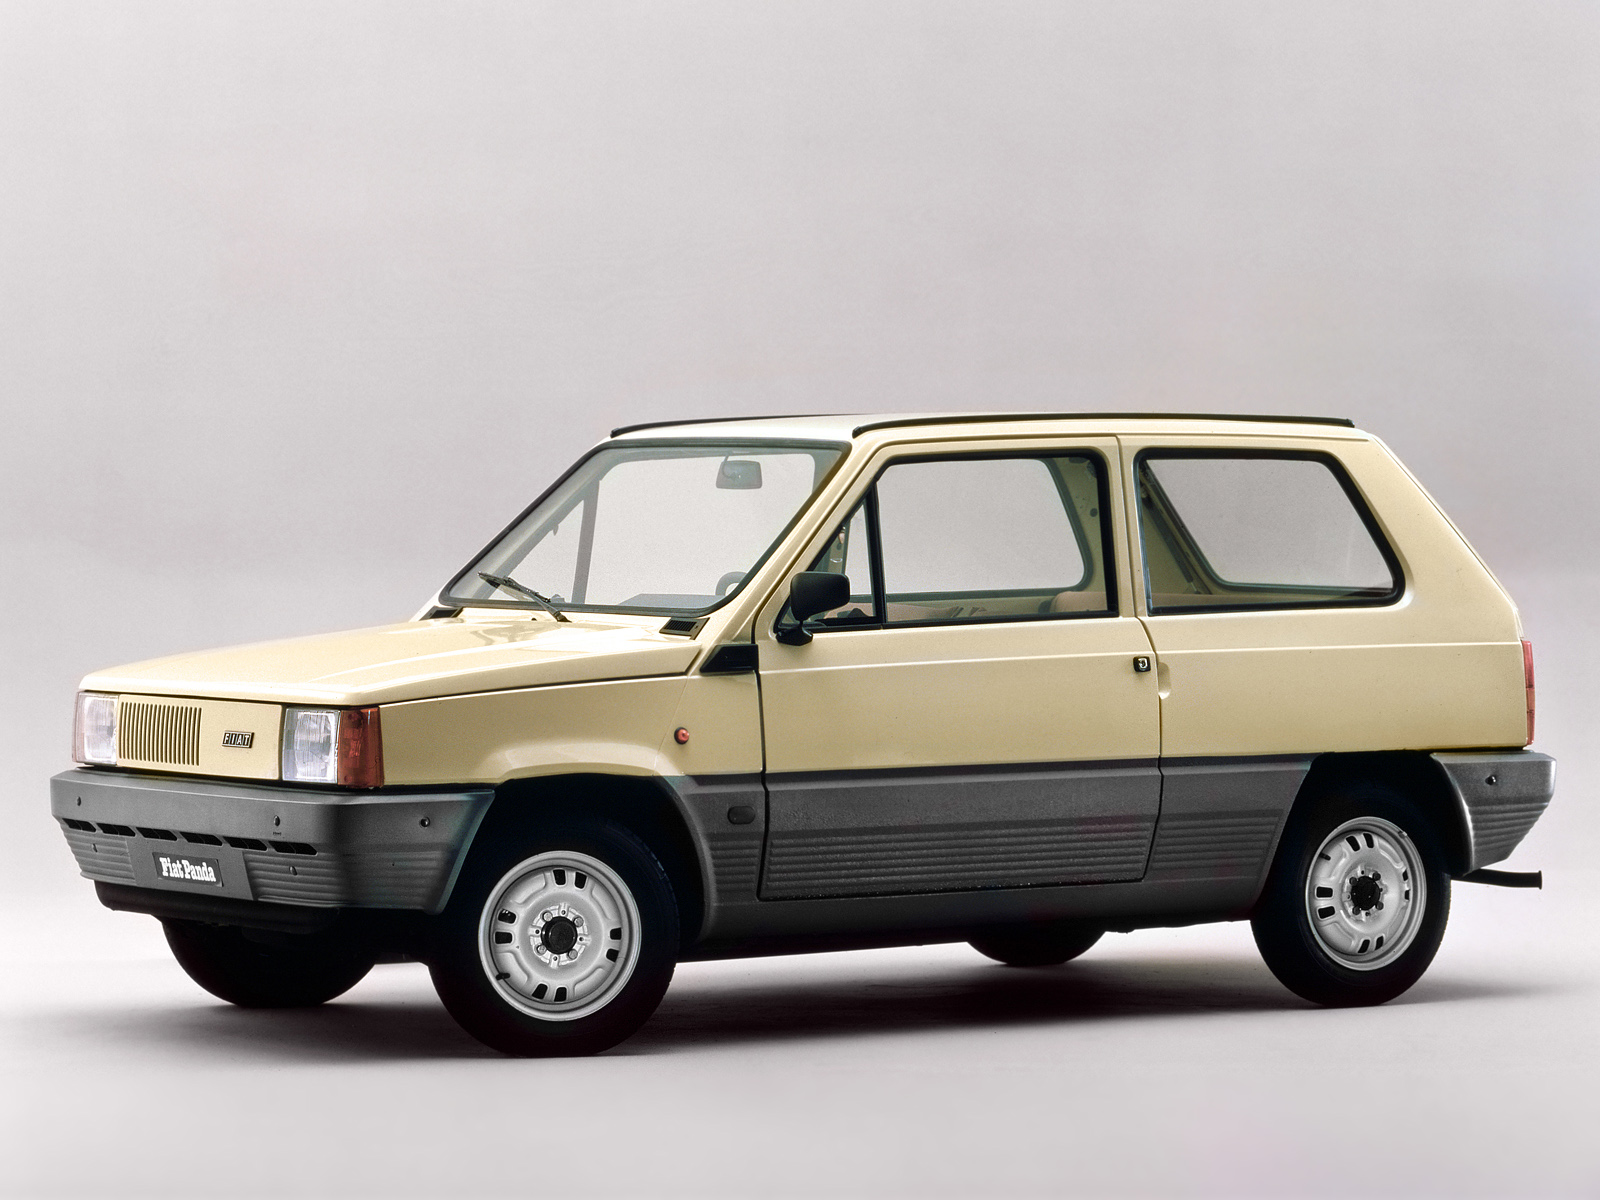 Motor Sport Fiat Panda 1980